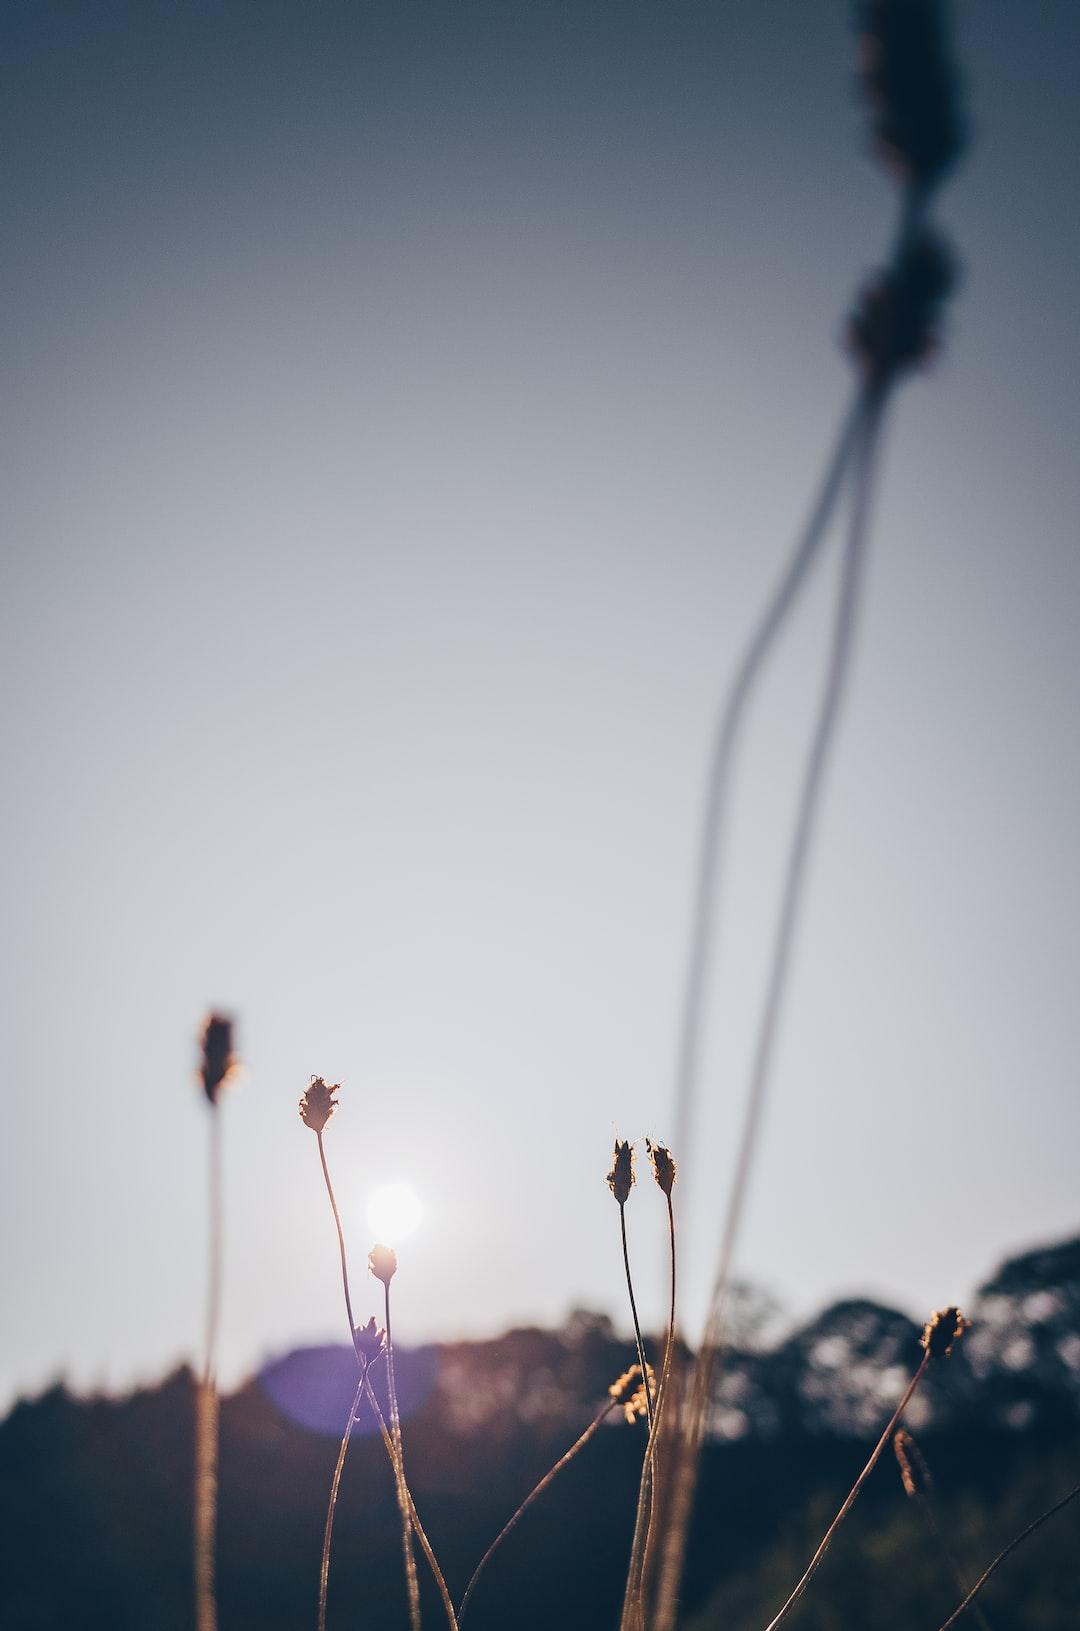 Ribwort plantain in the morning sun